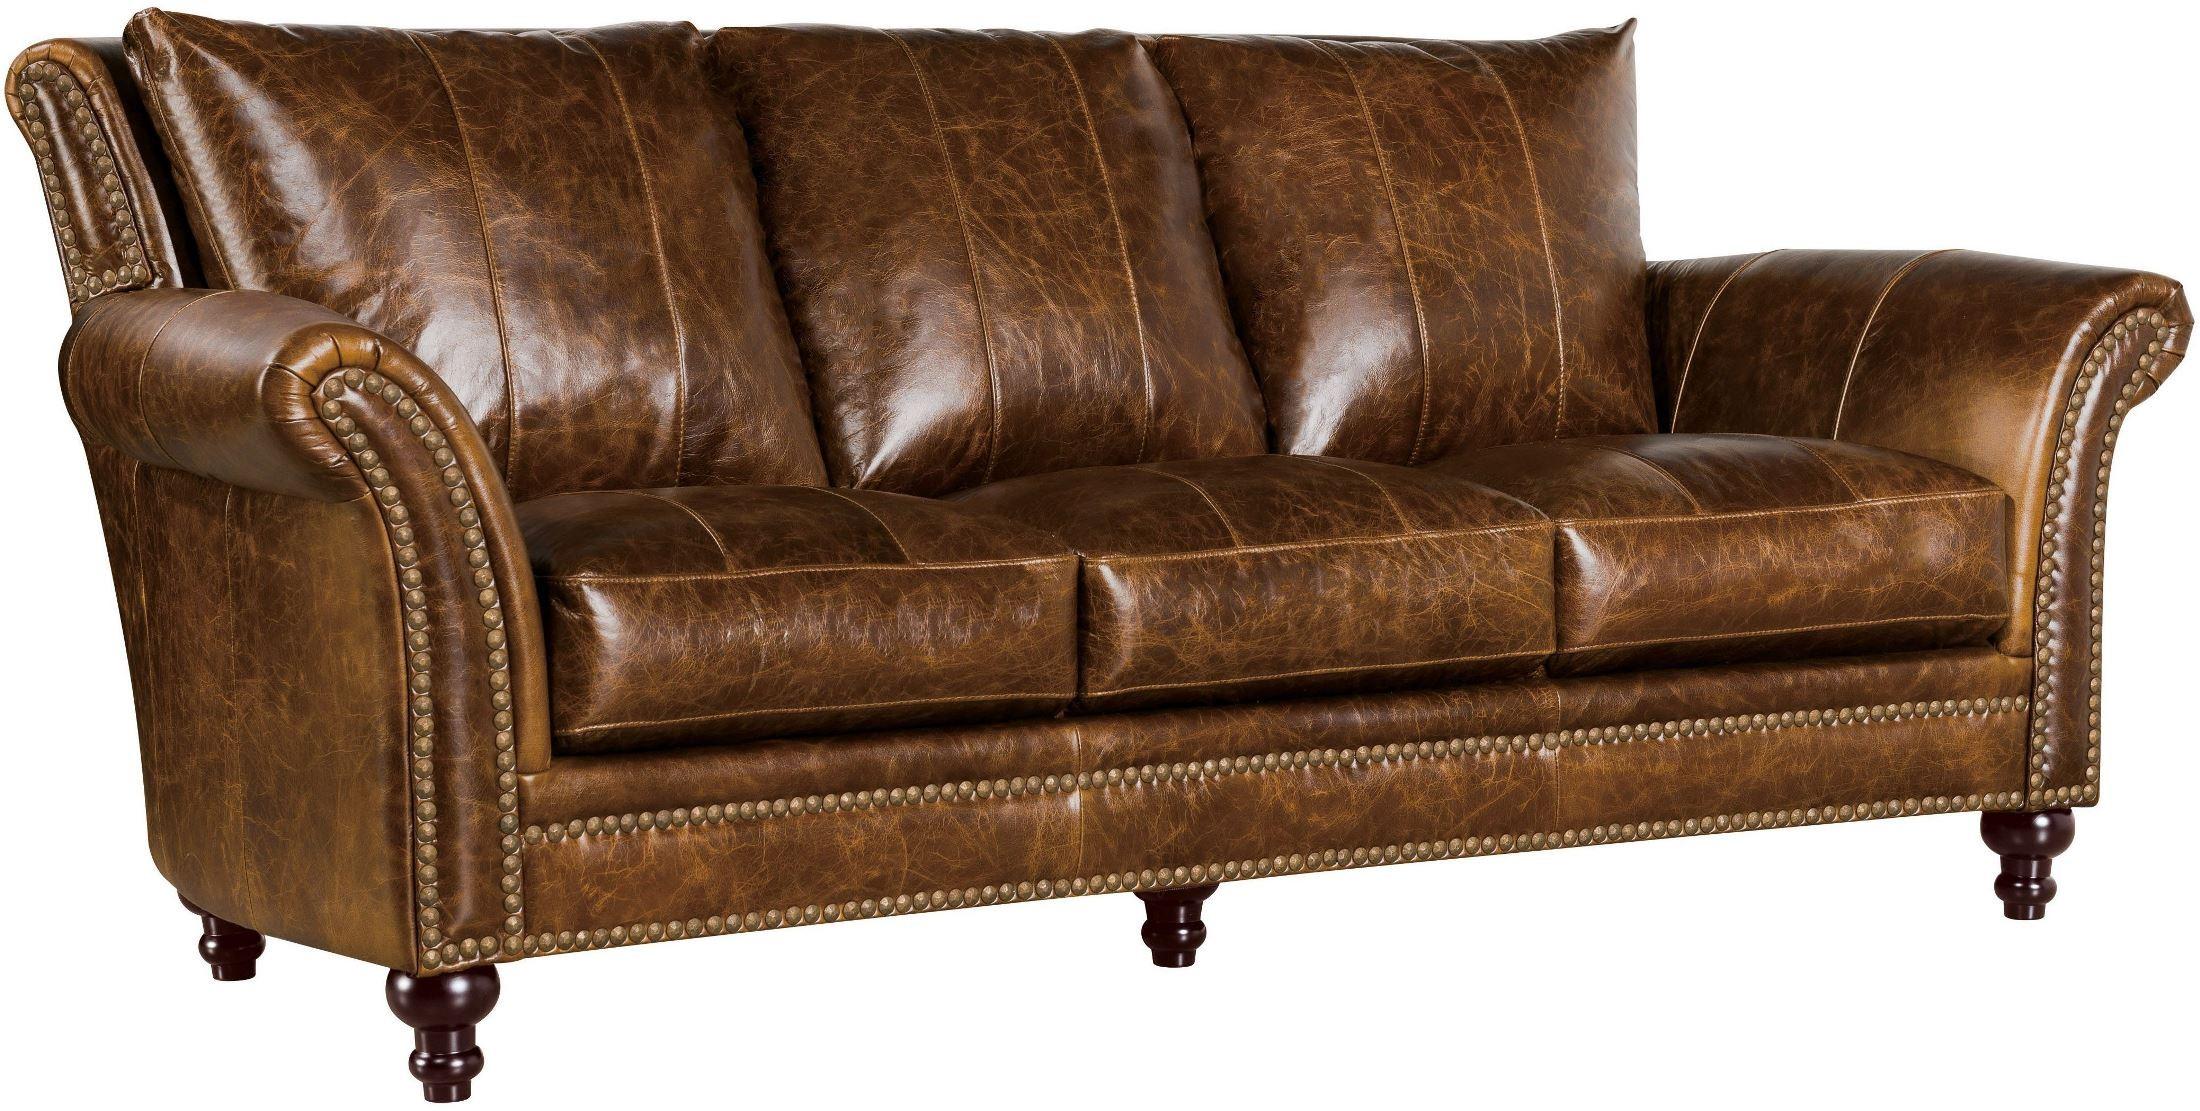 Georgetowne Butler Brown Leather Sofa 1669 2239 035507 Leather Italia